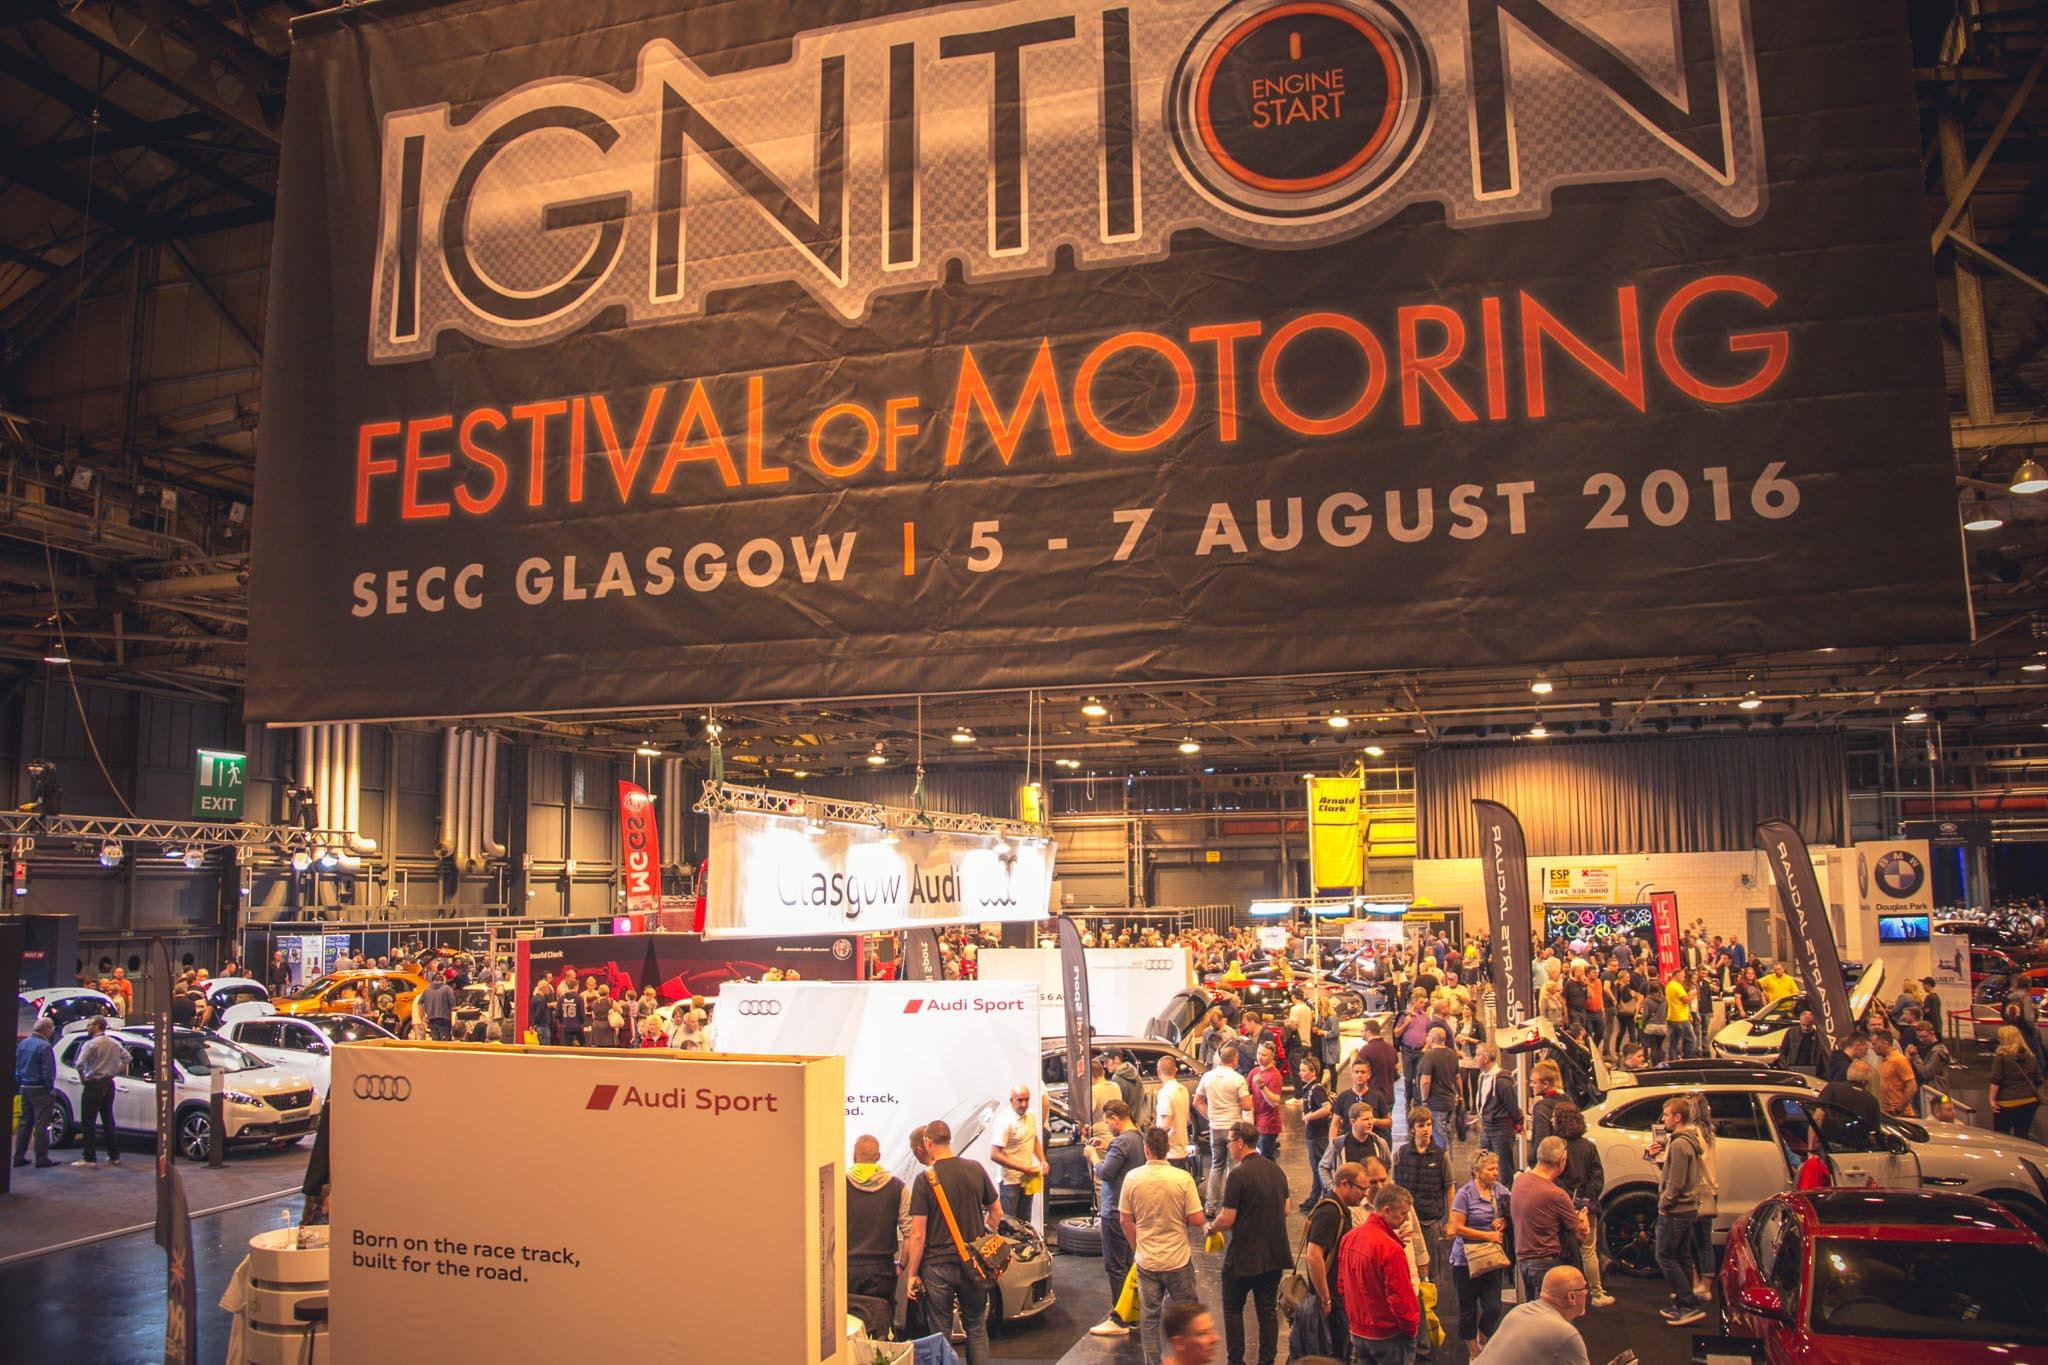 Ignition Festival of Motoring